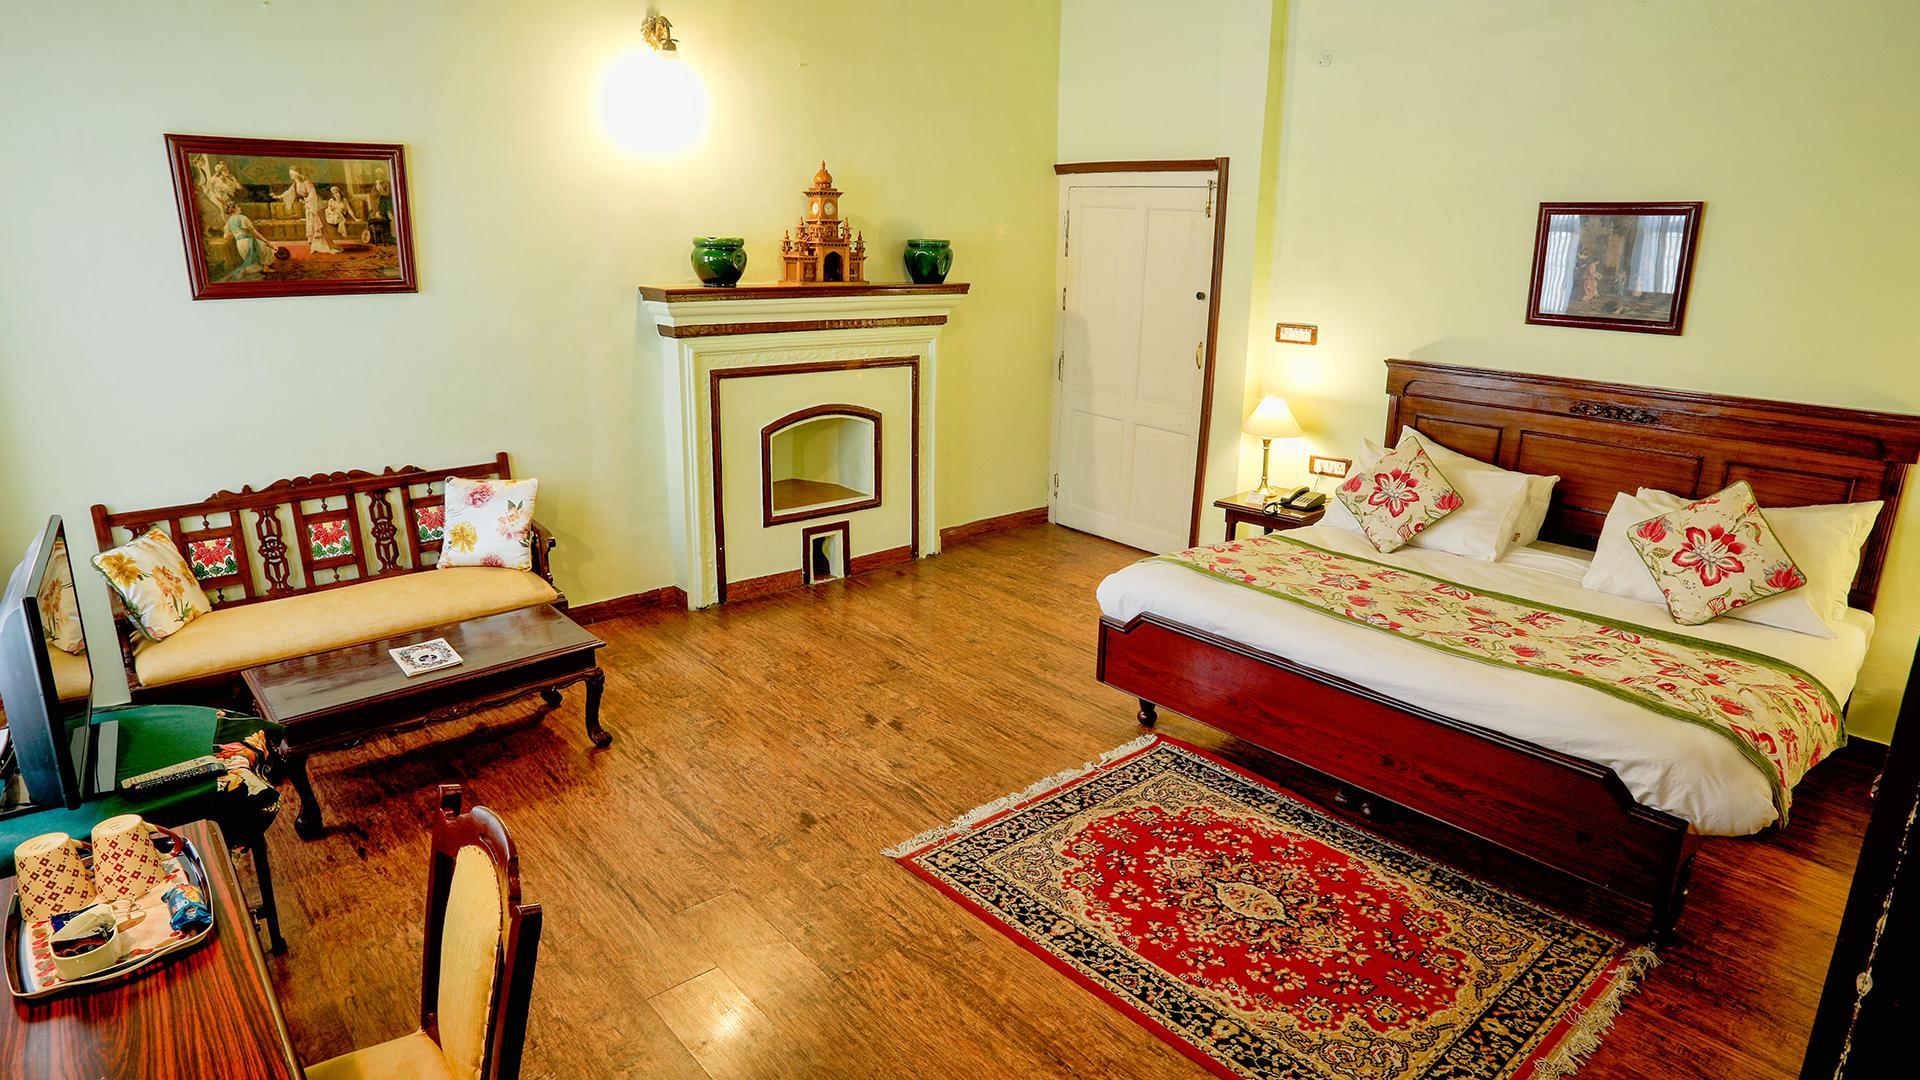 Deluxe Room image 1 at WelcomHeritage Kasmanda Palace Mussoorie by Dehradun, Uttarakhand, India